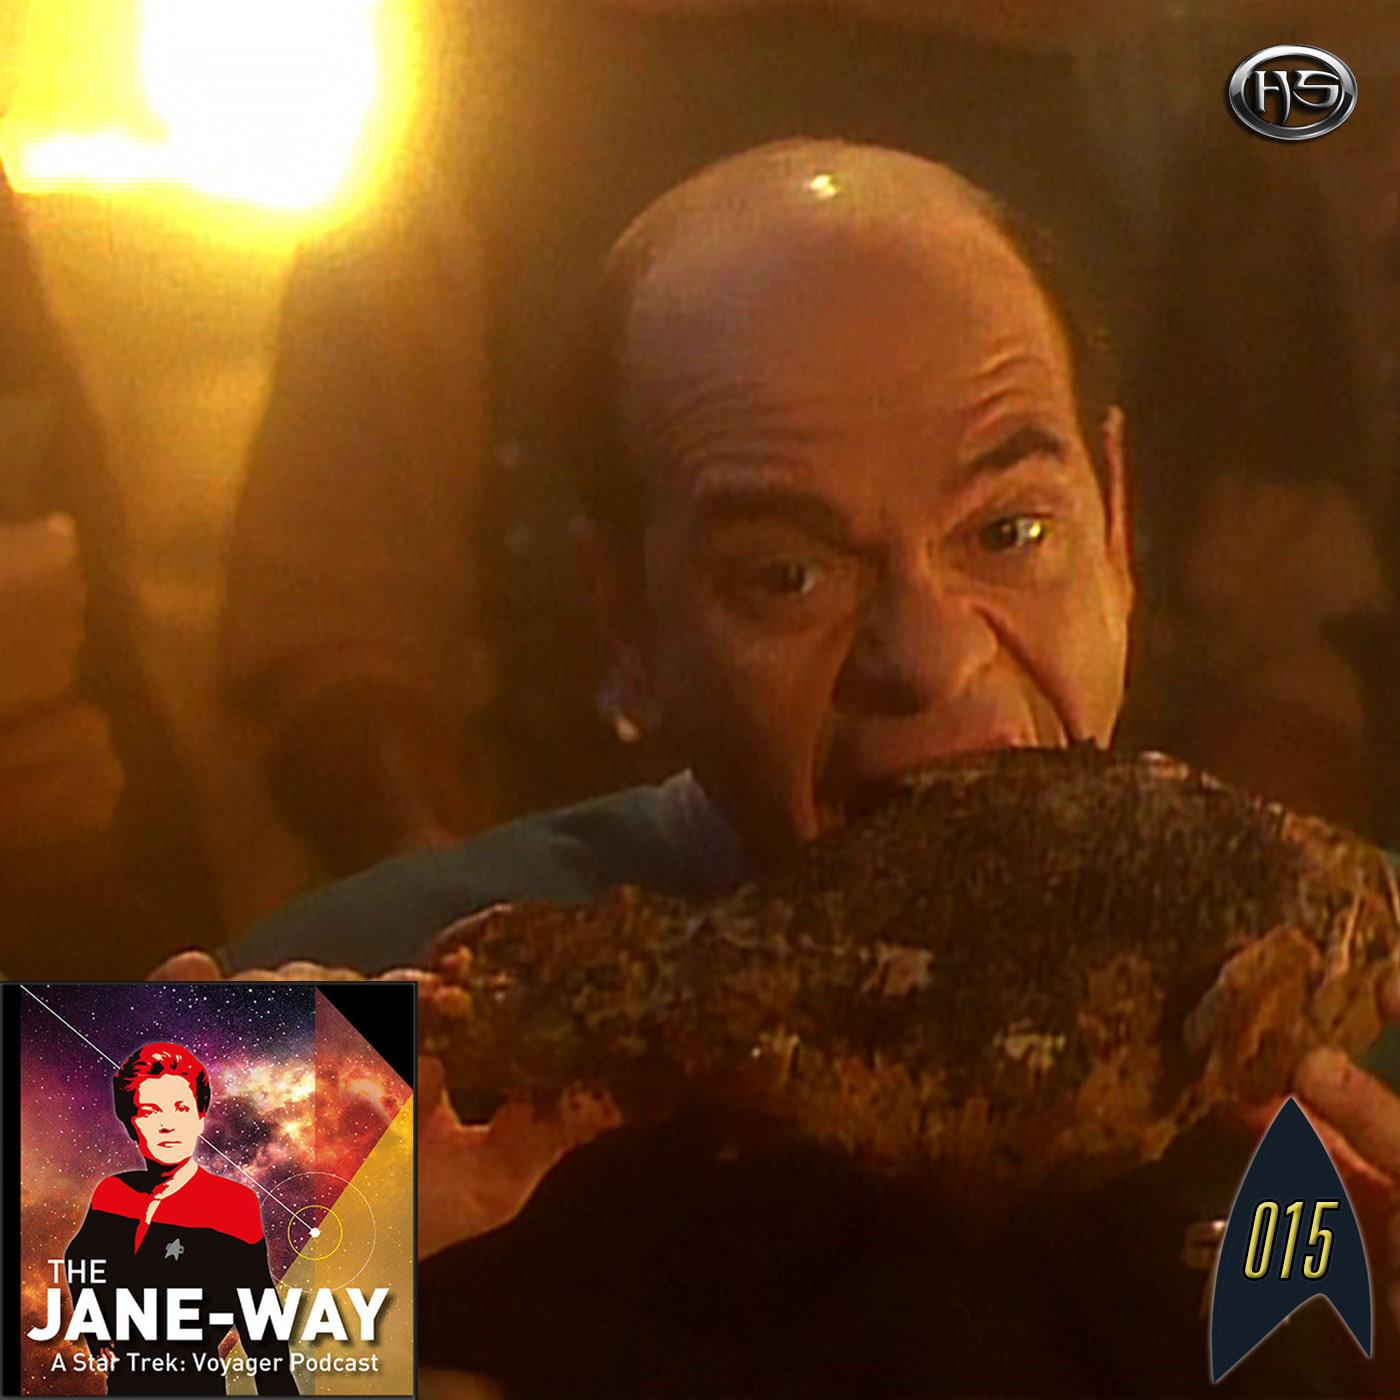 The Jane-Way Episode 15